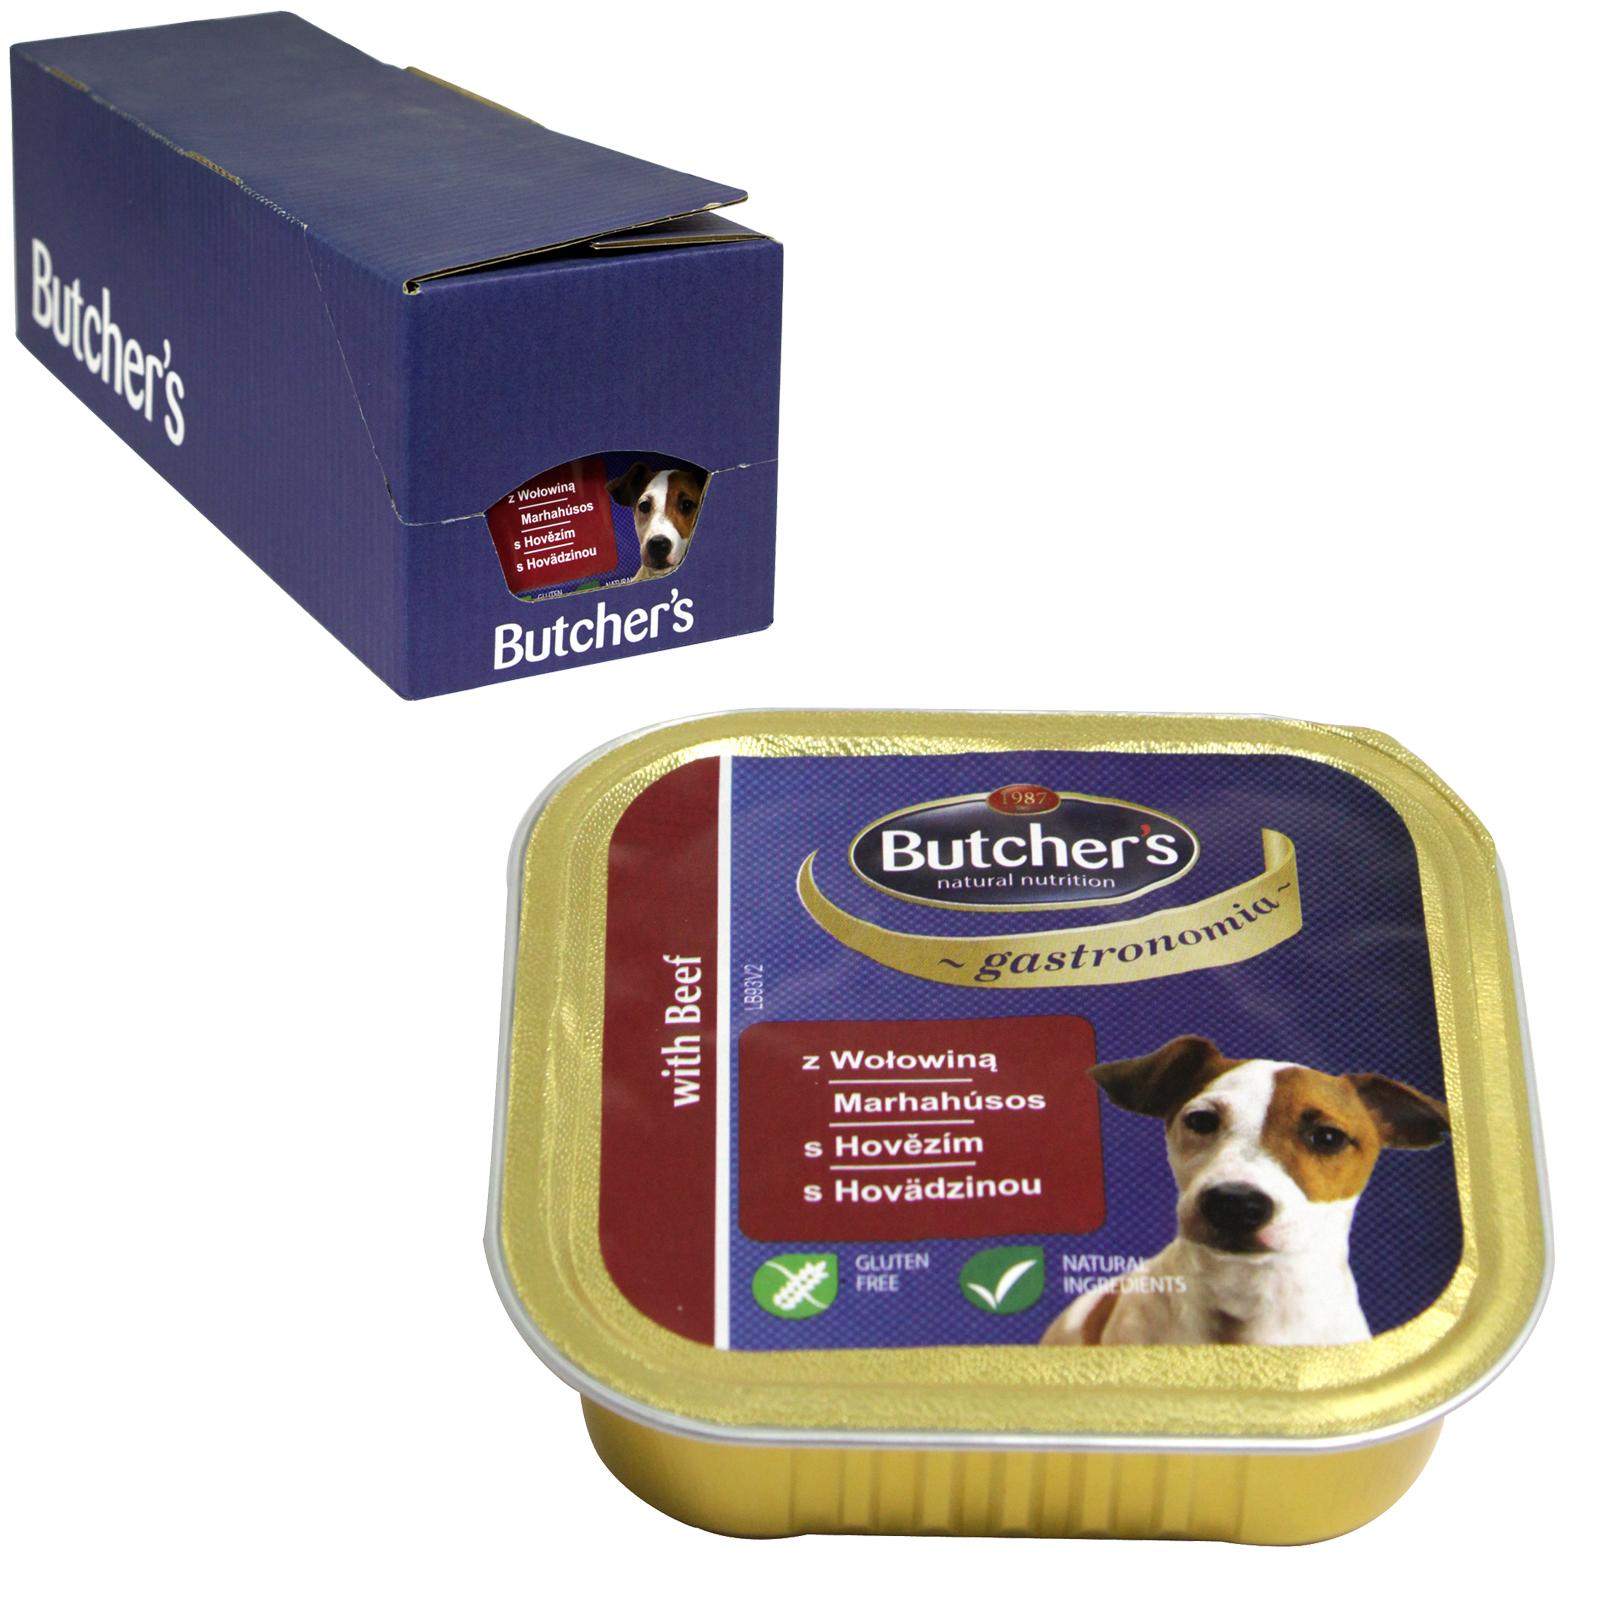 BUTCHERS GASTRONOMIA BEEF FOILS DOG 150G X12